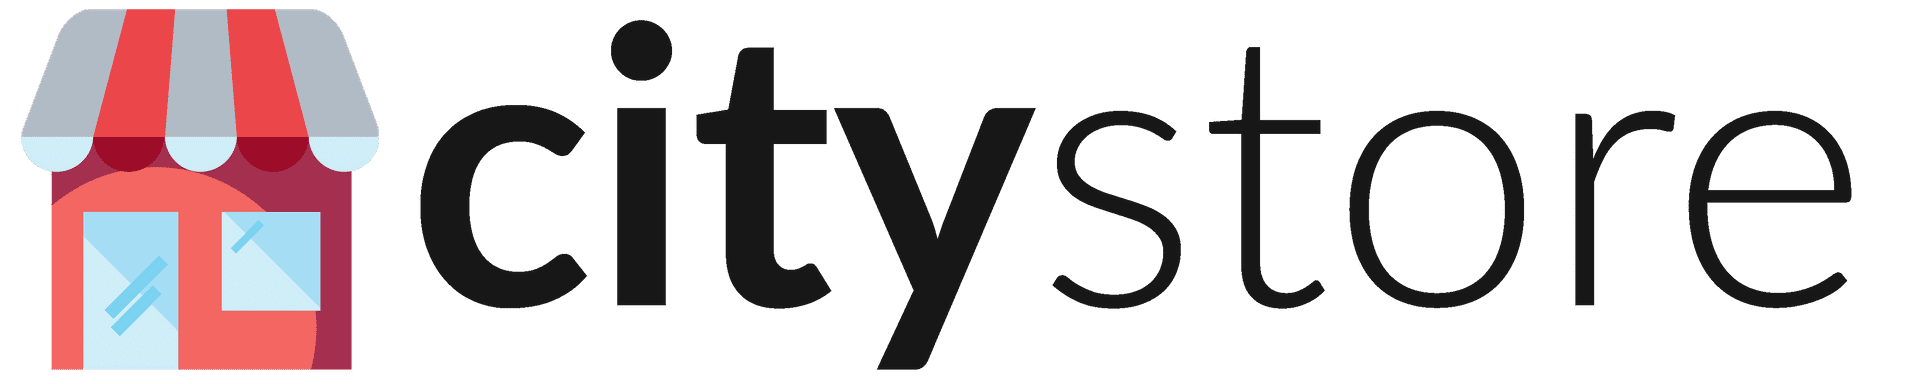 Citystore logo